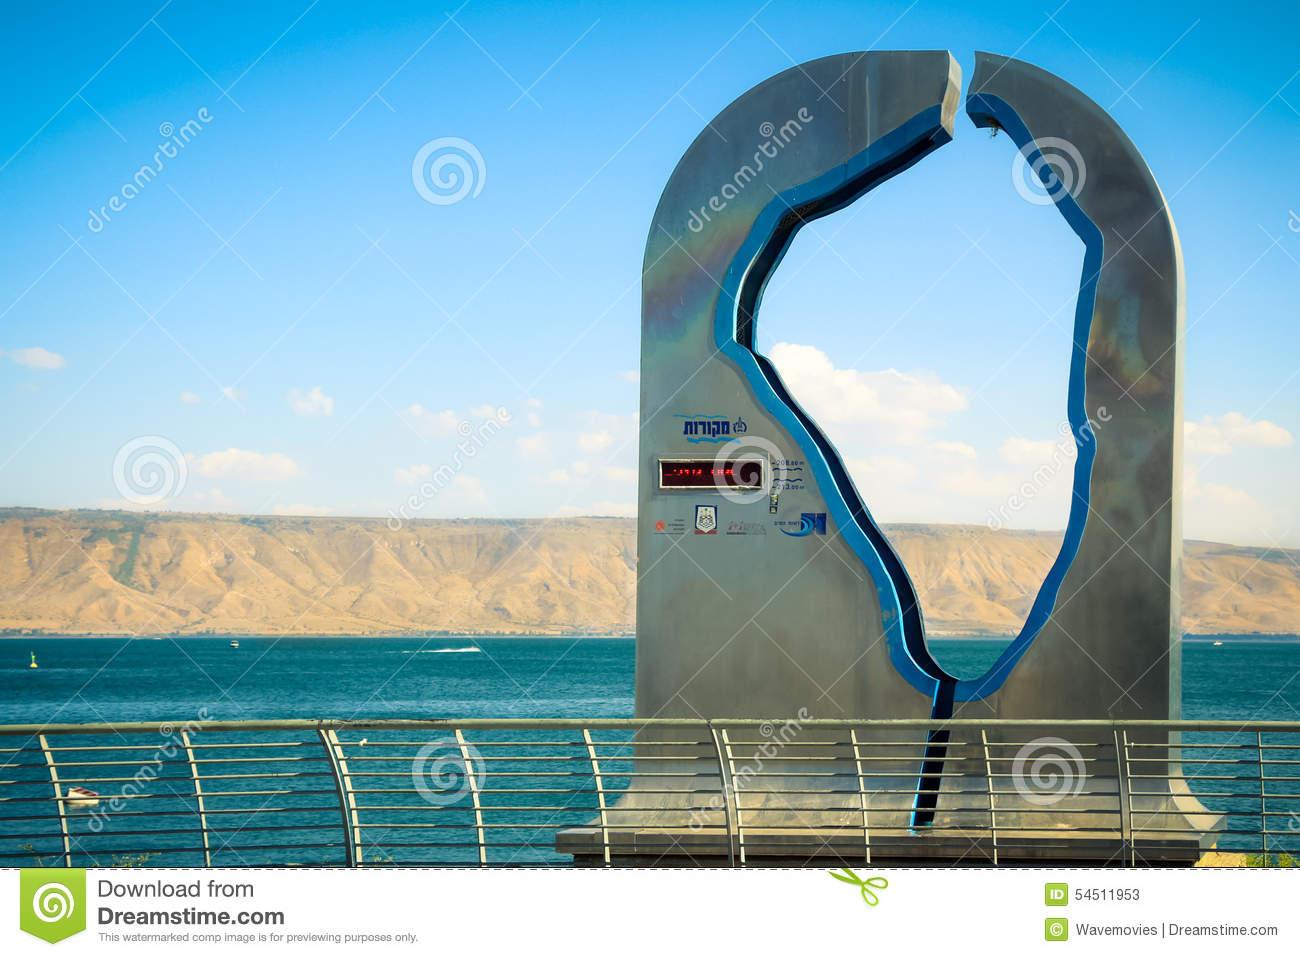 Water Level Surveyor, Israel 2019.